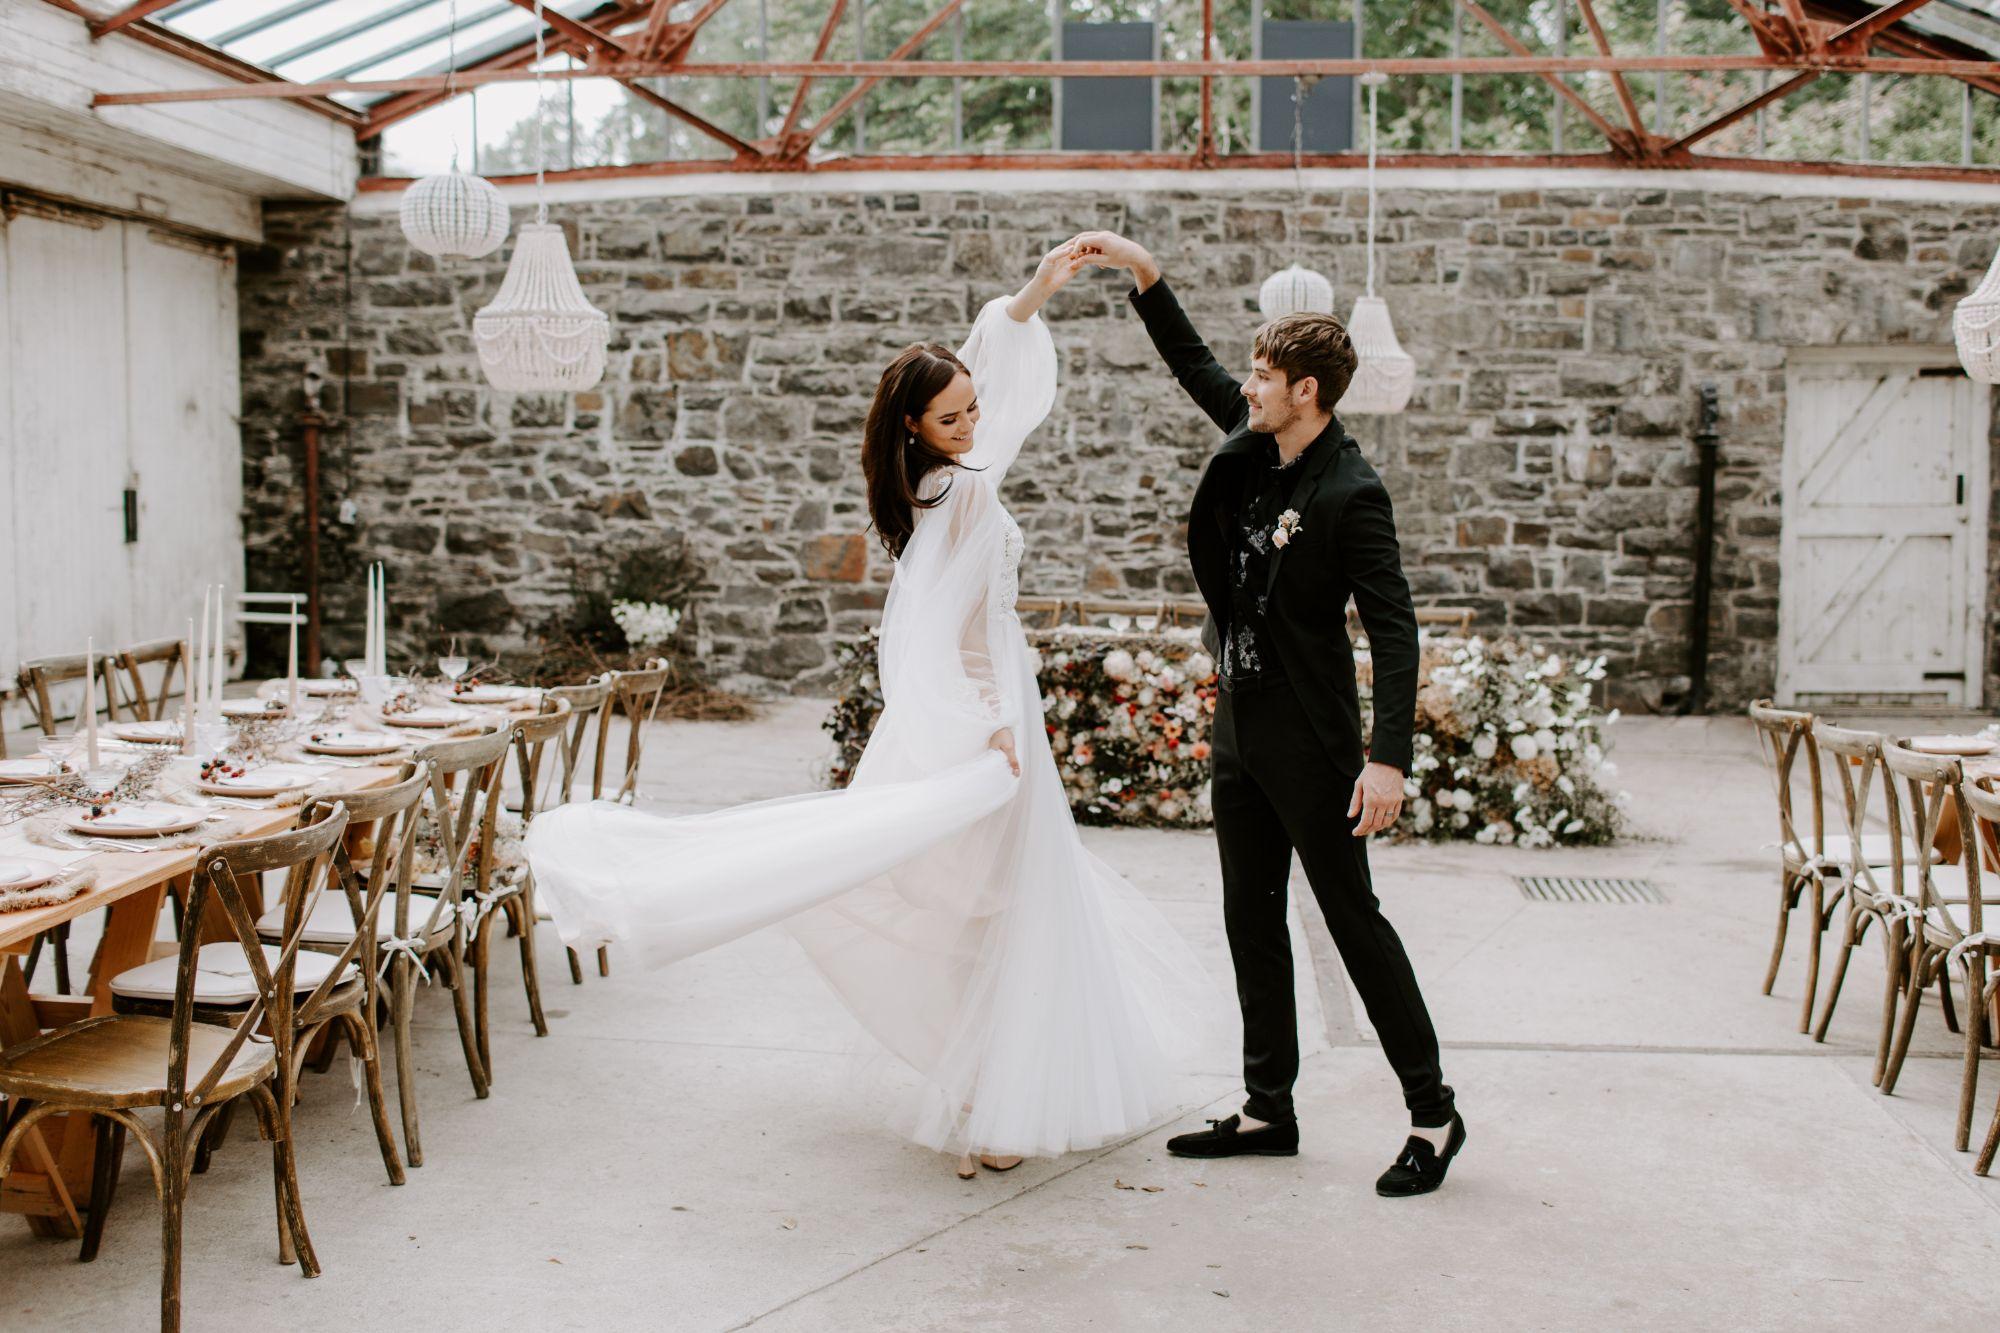 Wedding_Photography_Becky_Tranter-98.jpg